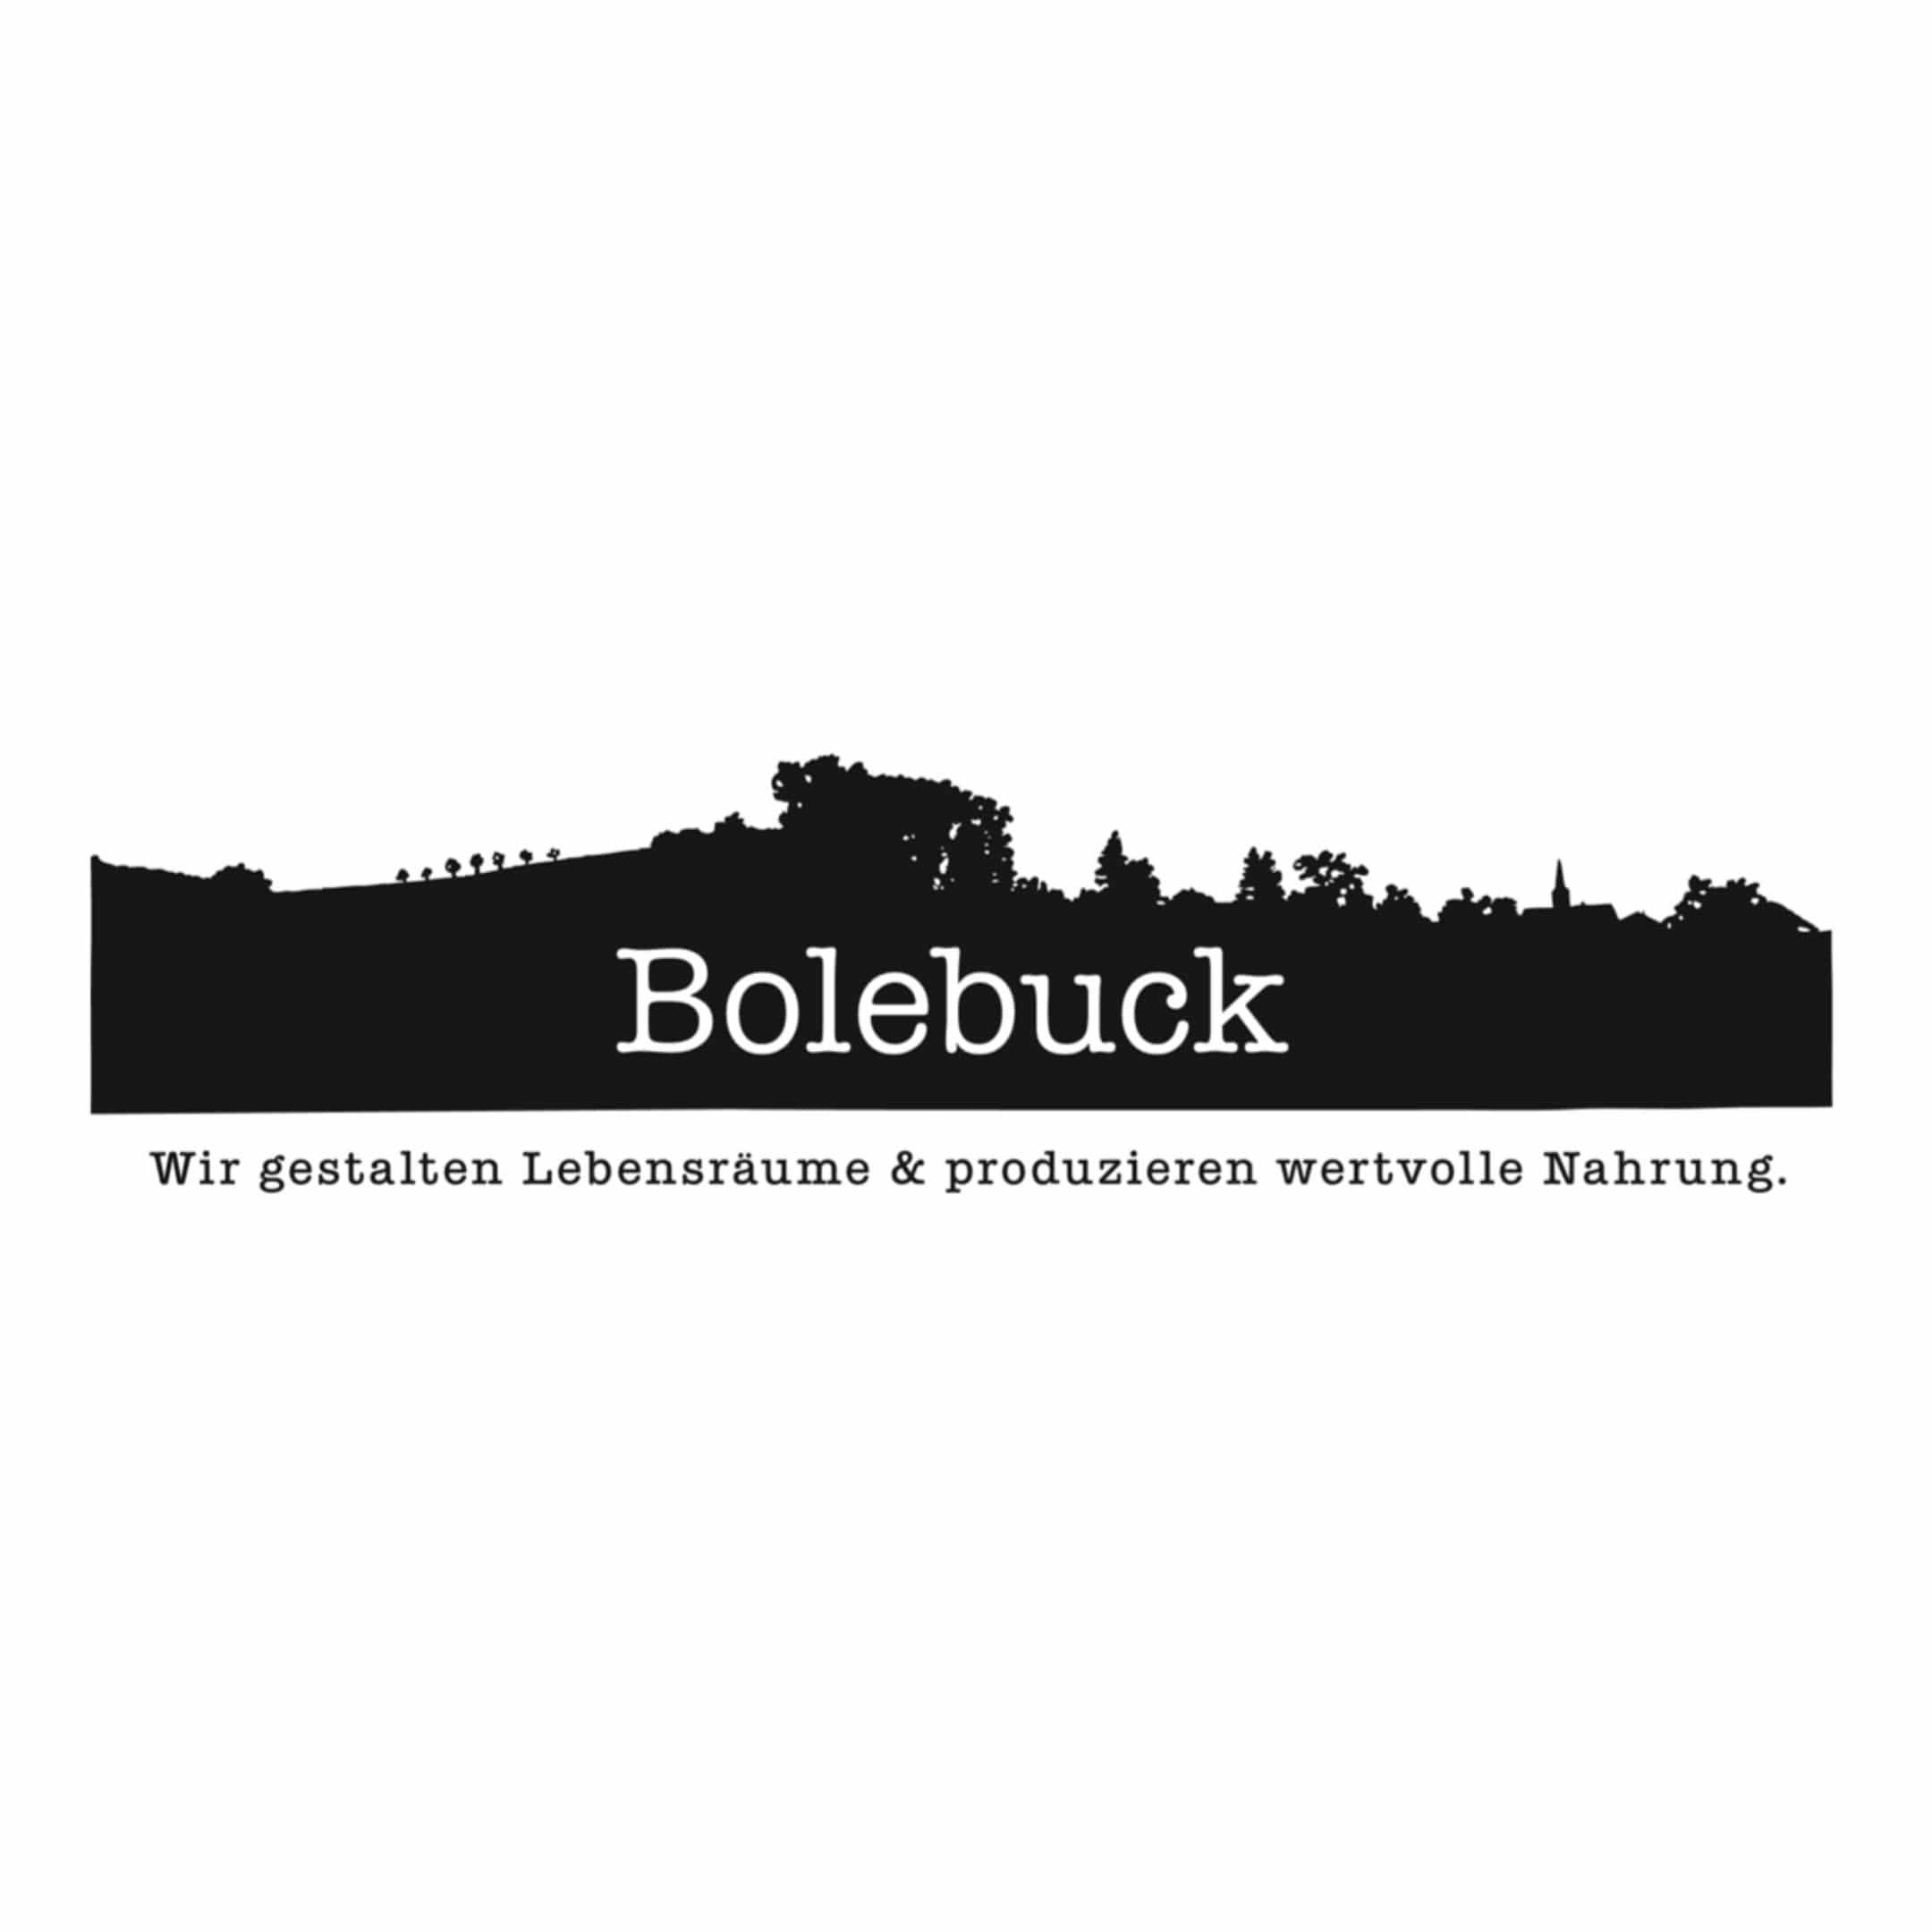 Bolebuck